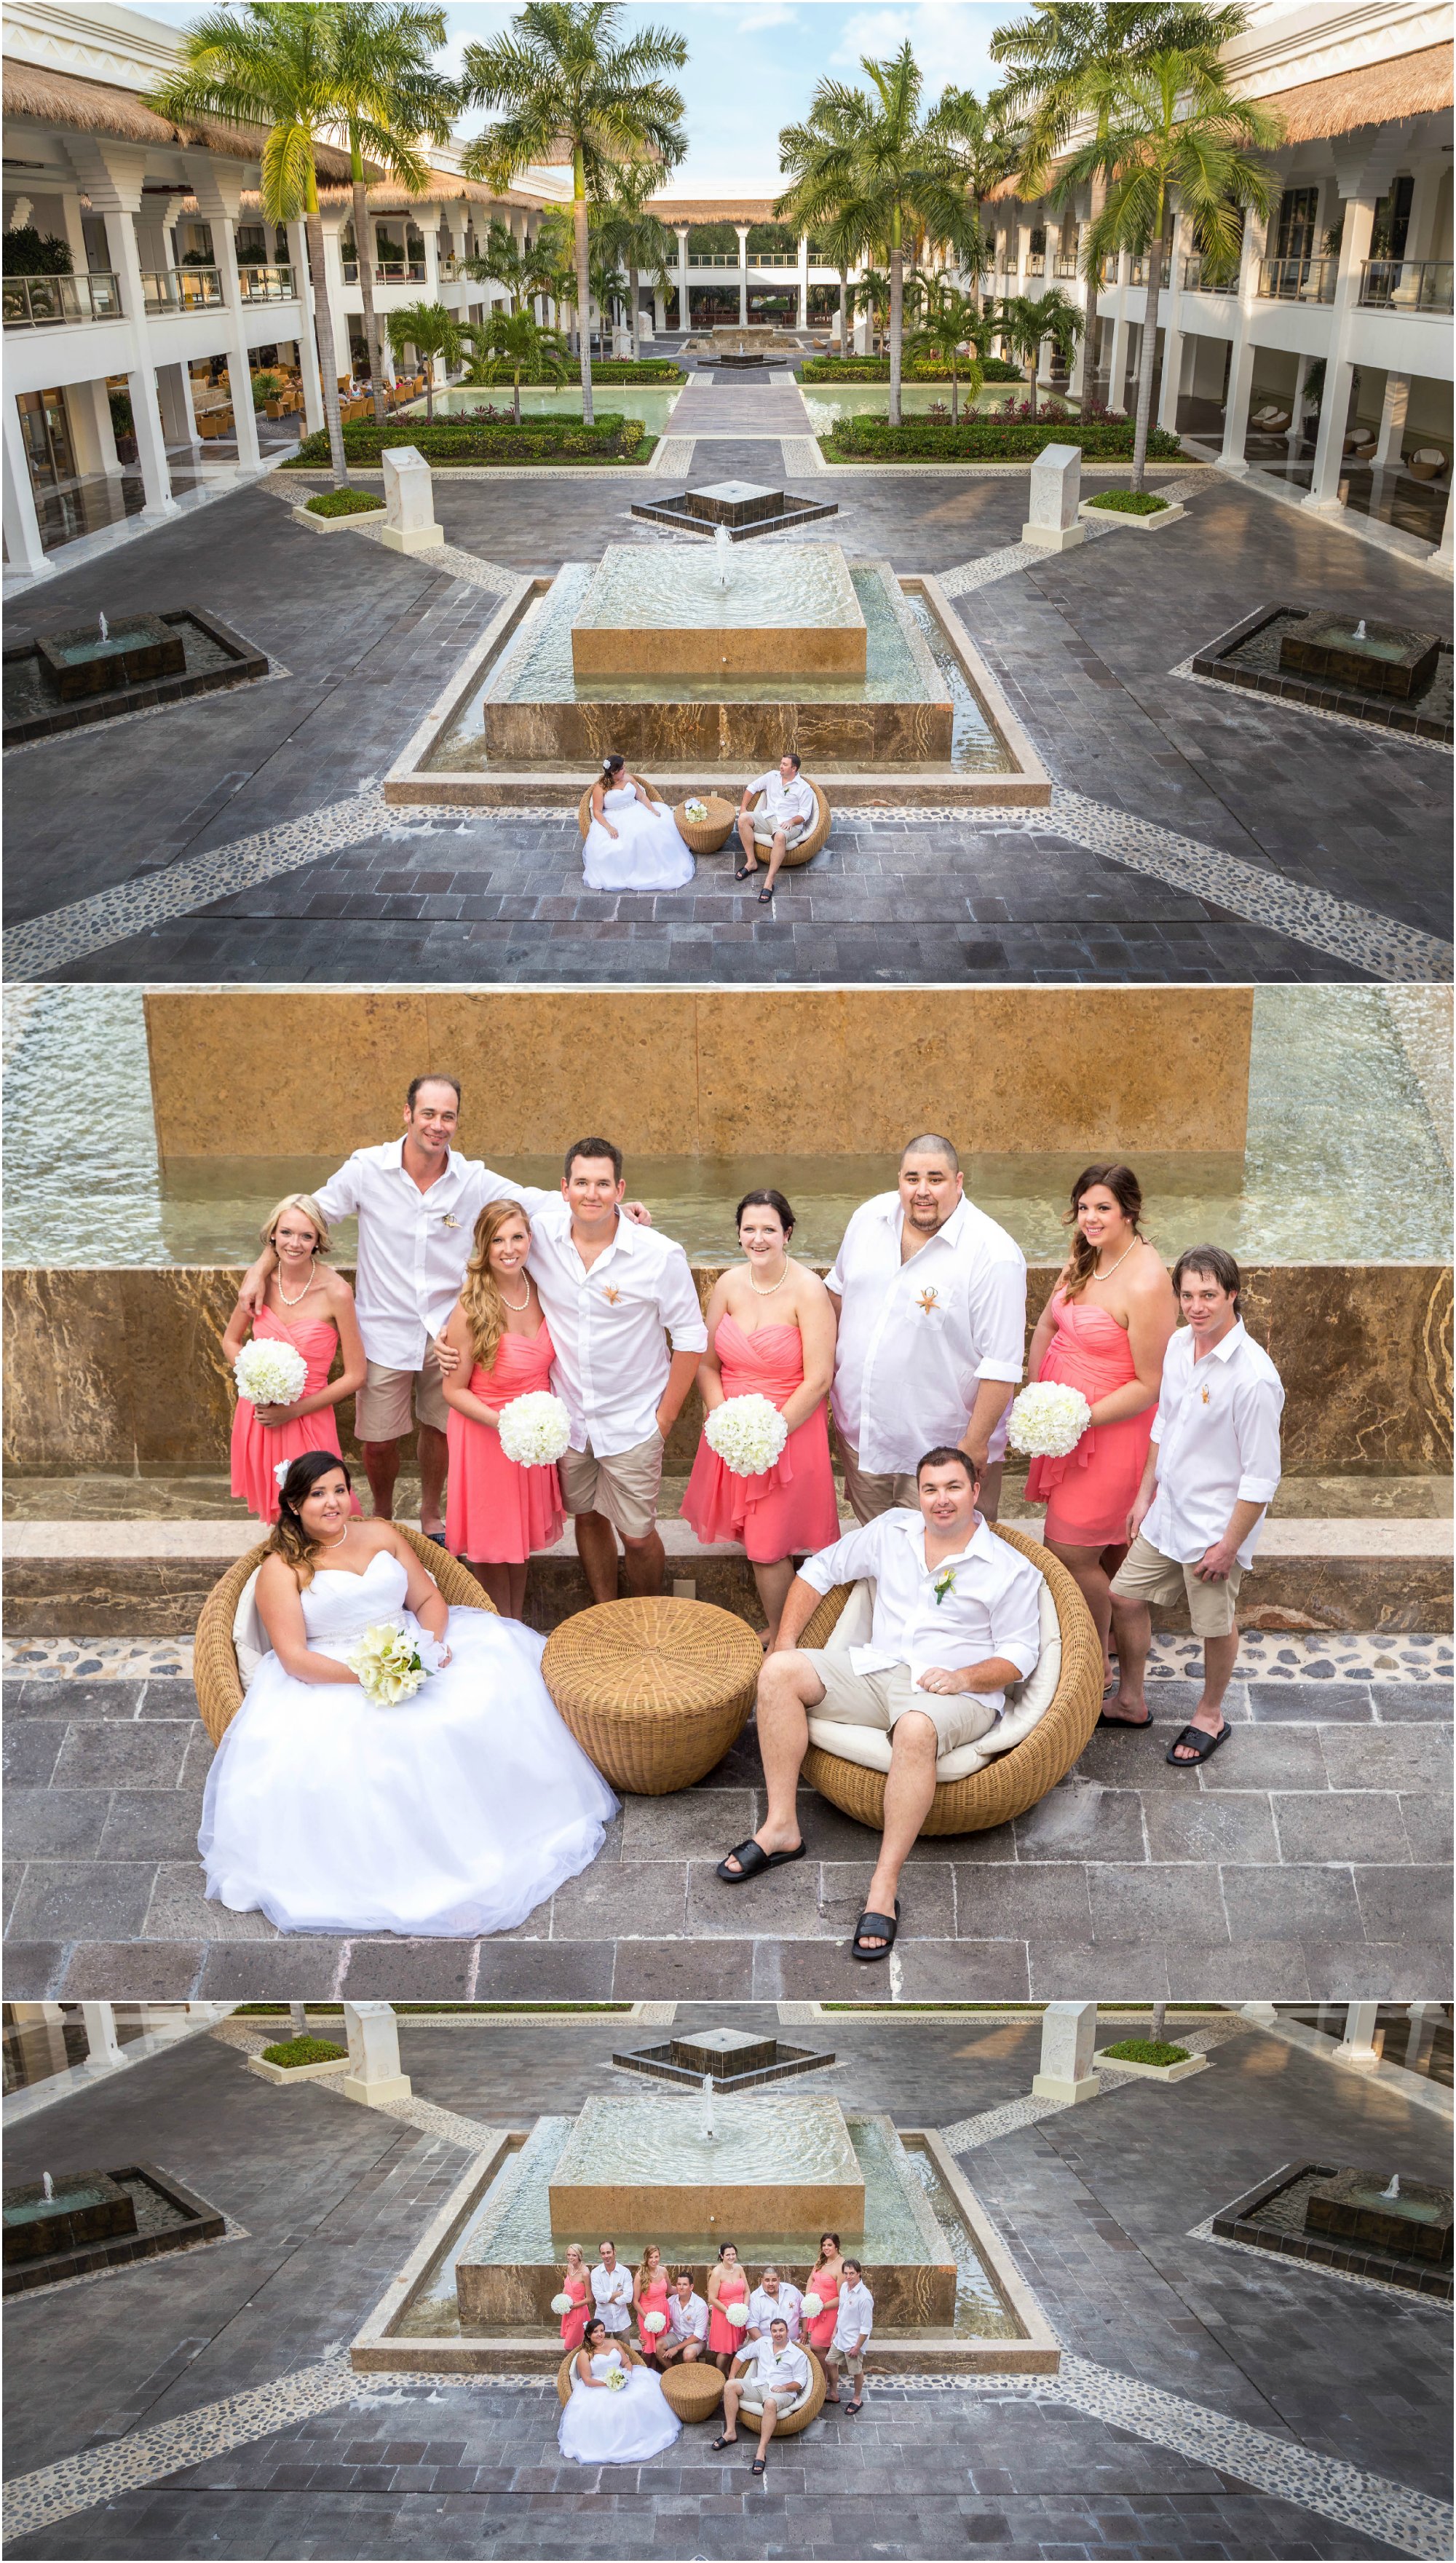 cancun_wedding27.png